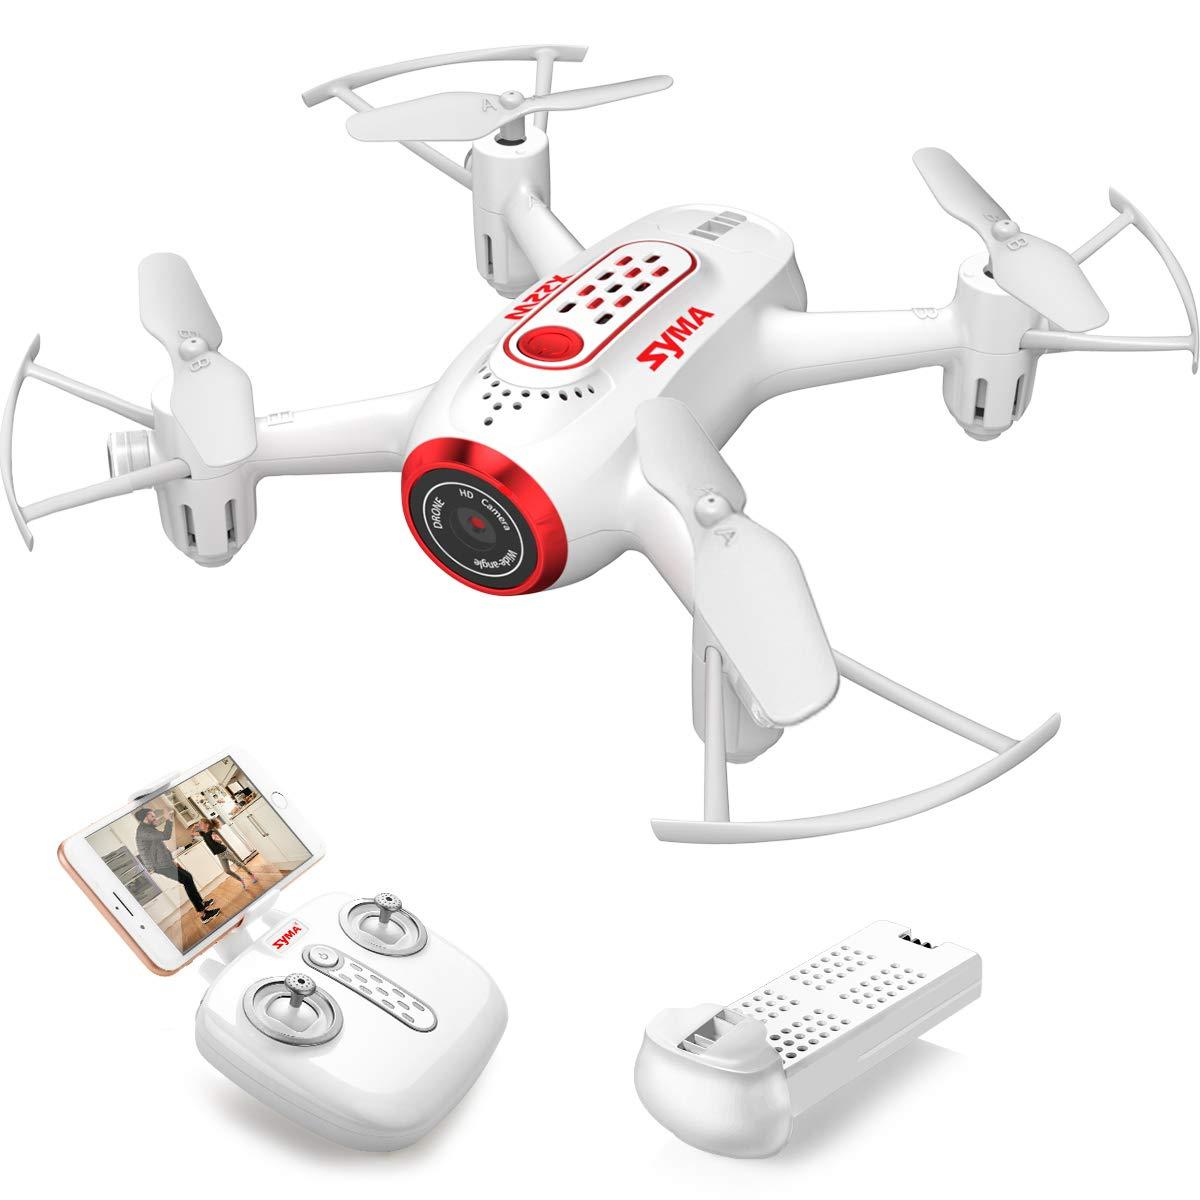 syma x22w batteria  : SYMA X22W Drone with Camera Live Video FPV Nano Pocket ...